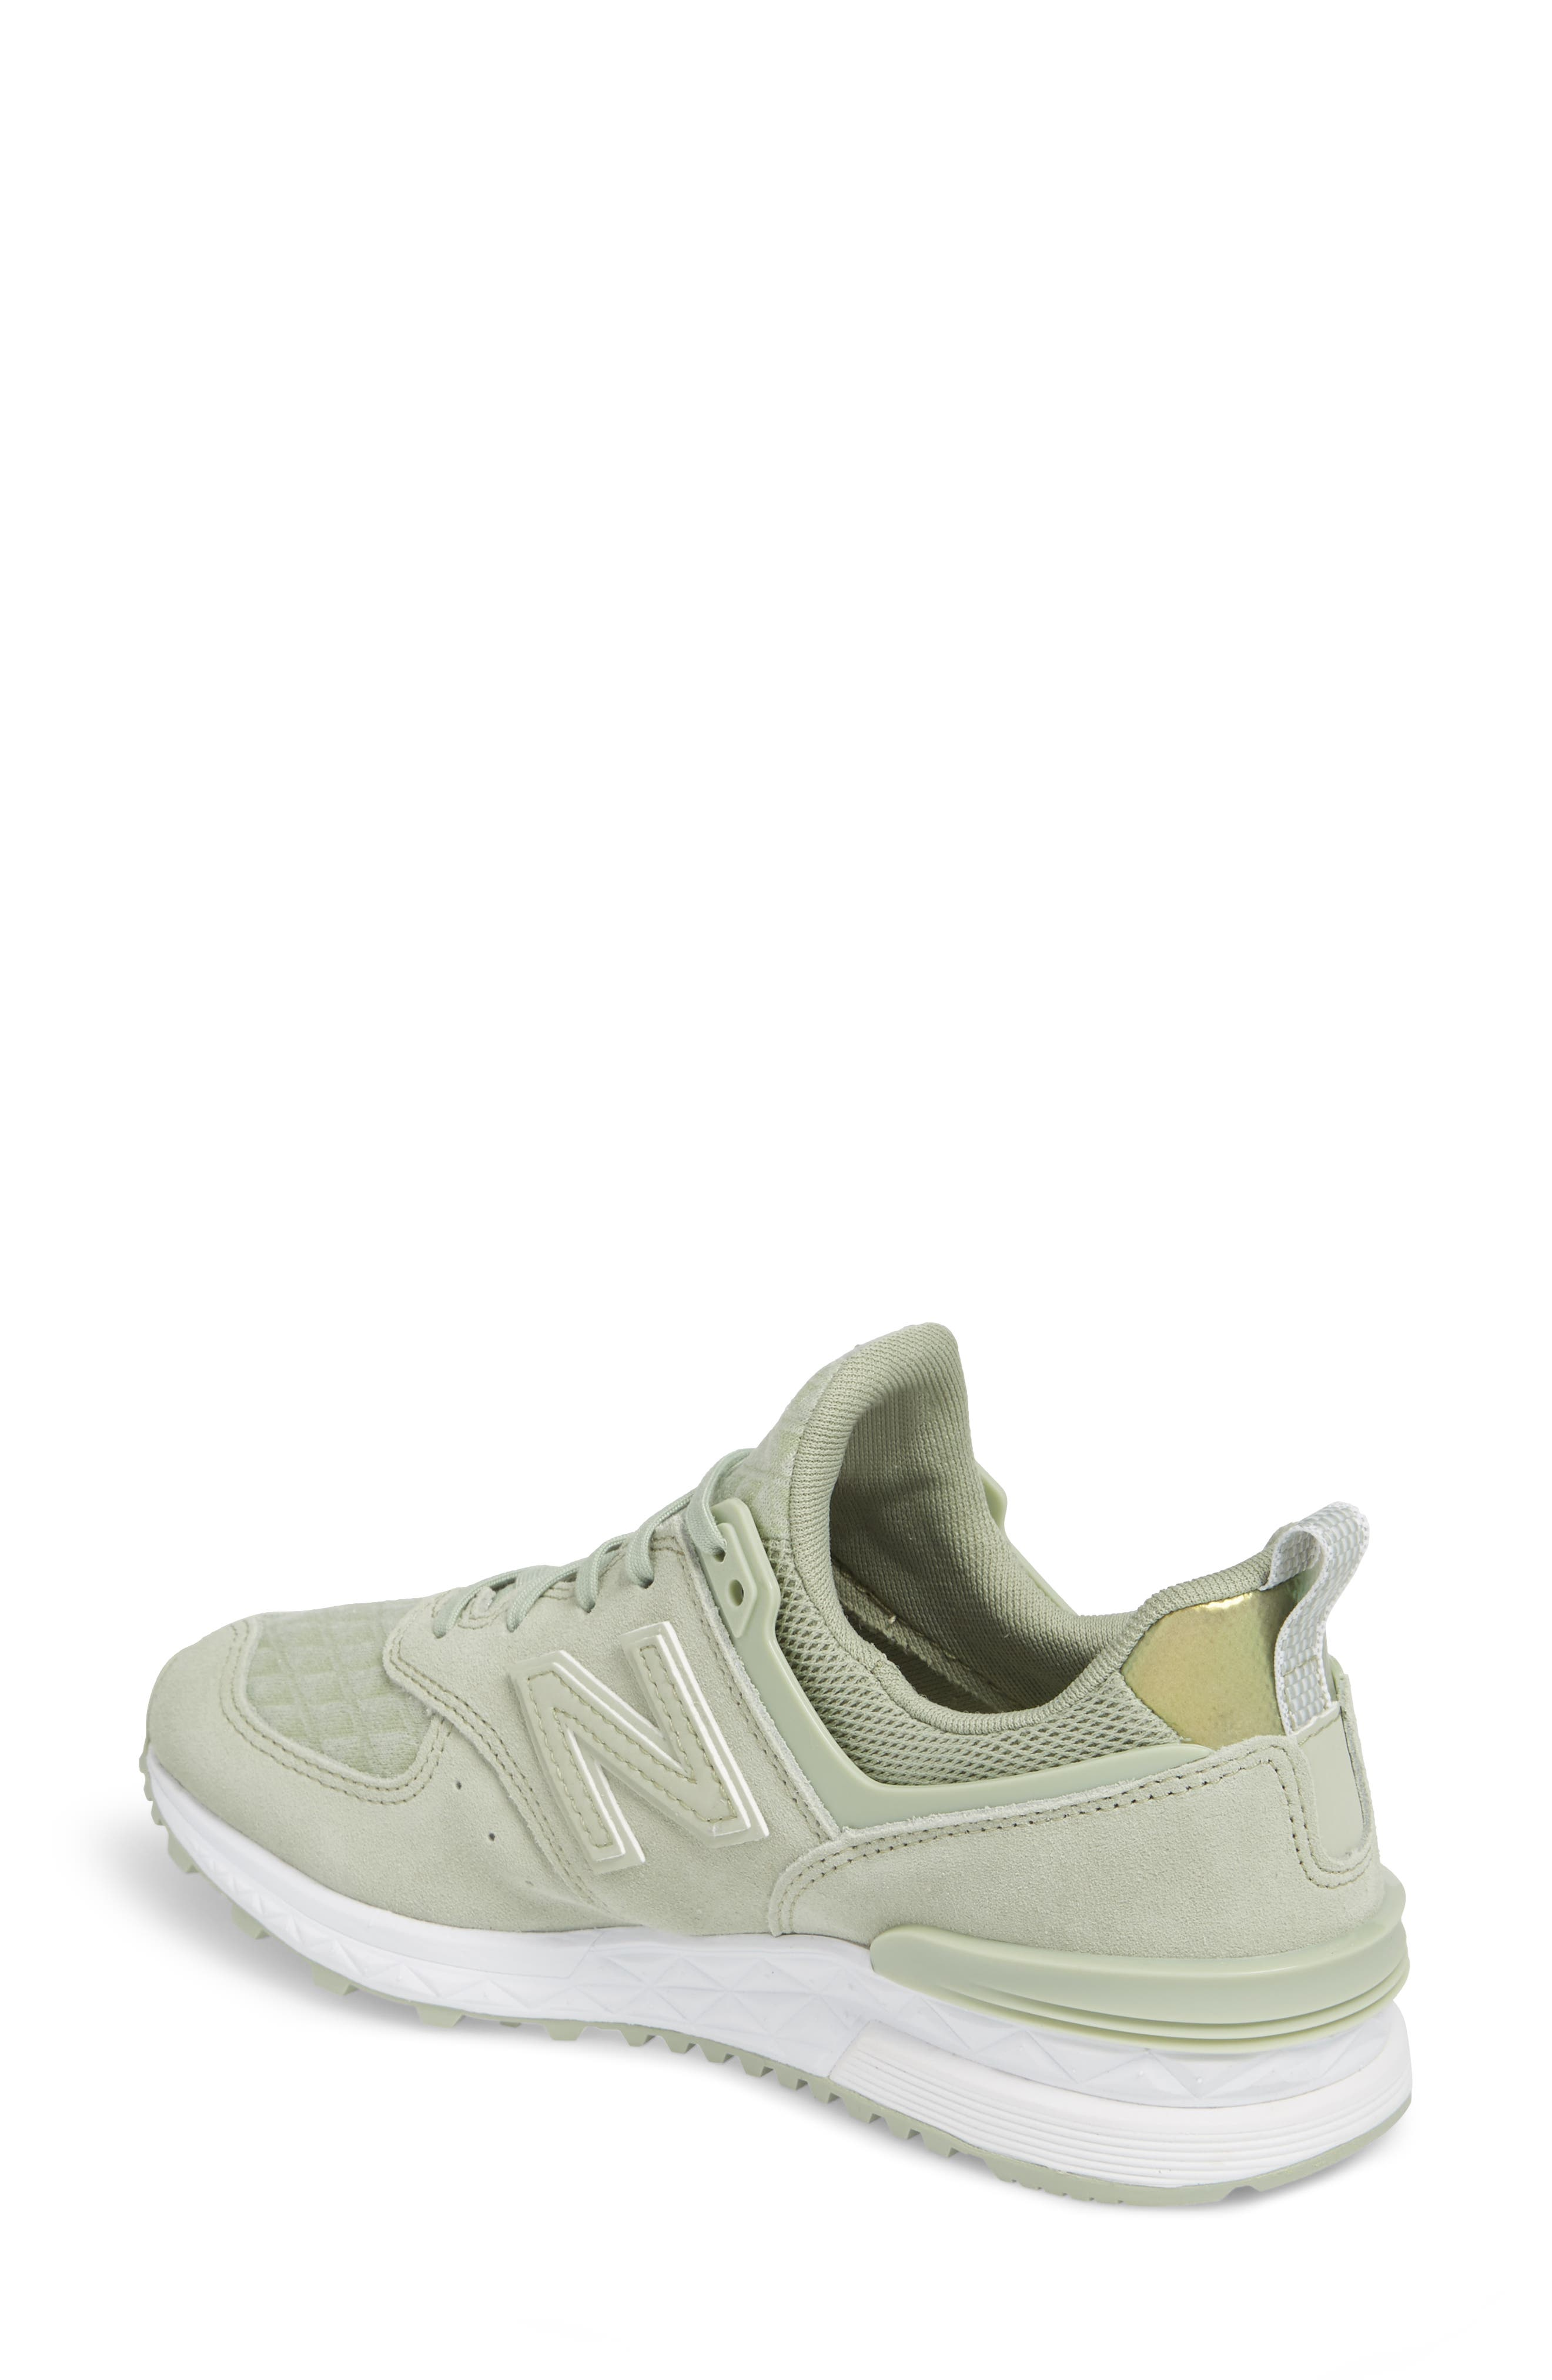 '574' Sneaker,                             Alternate thumbnail 2, color,                             Silver Mint